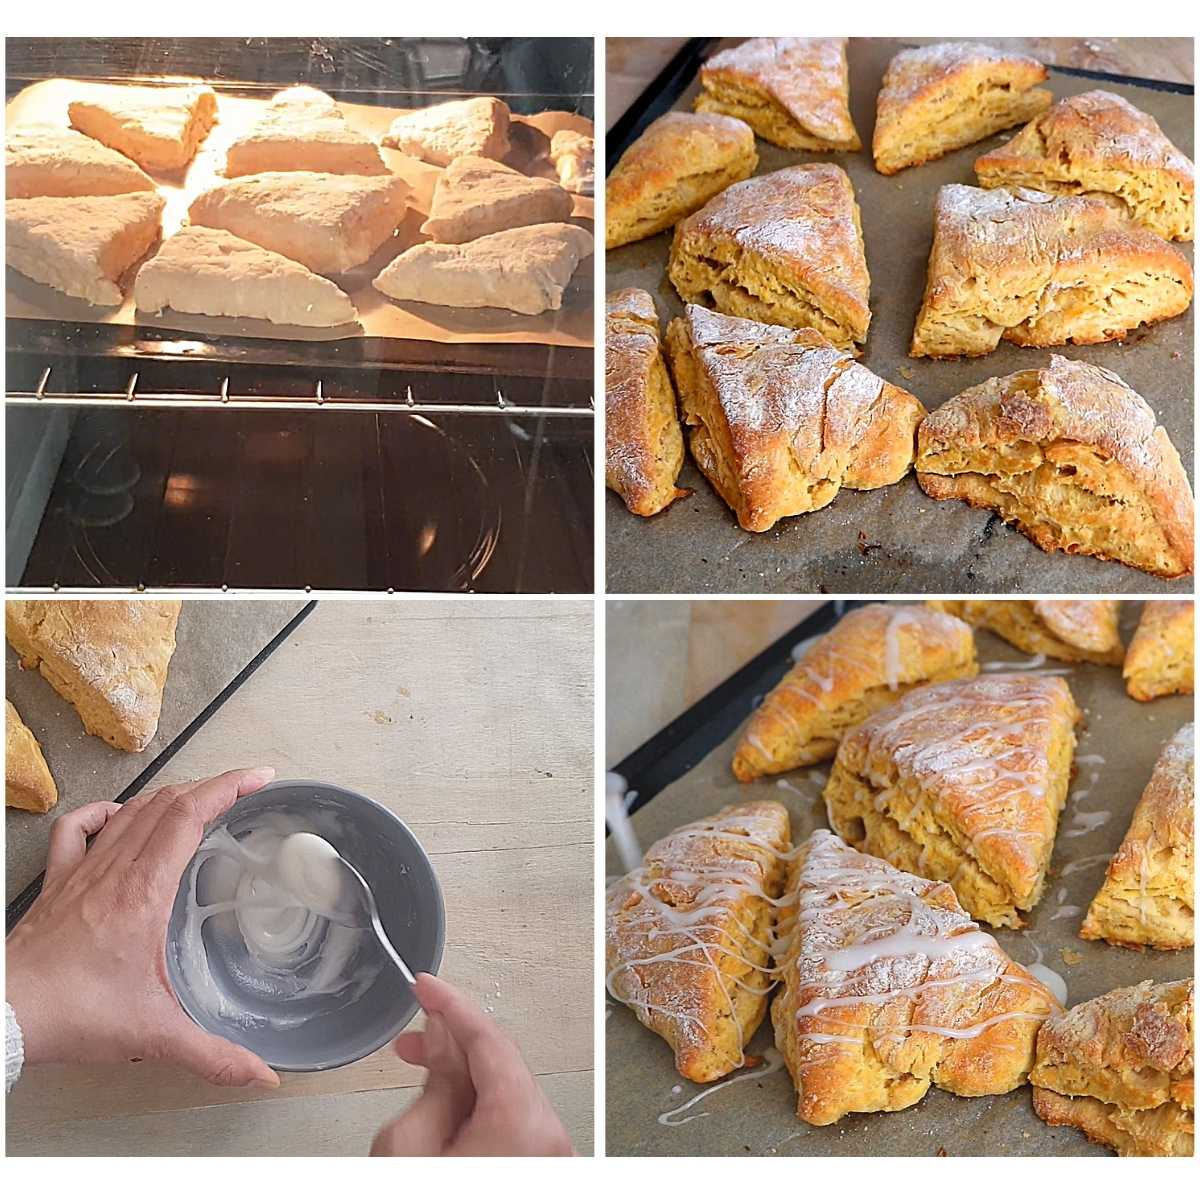 baking and glazing the vegan pumpkin scones